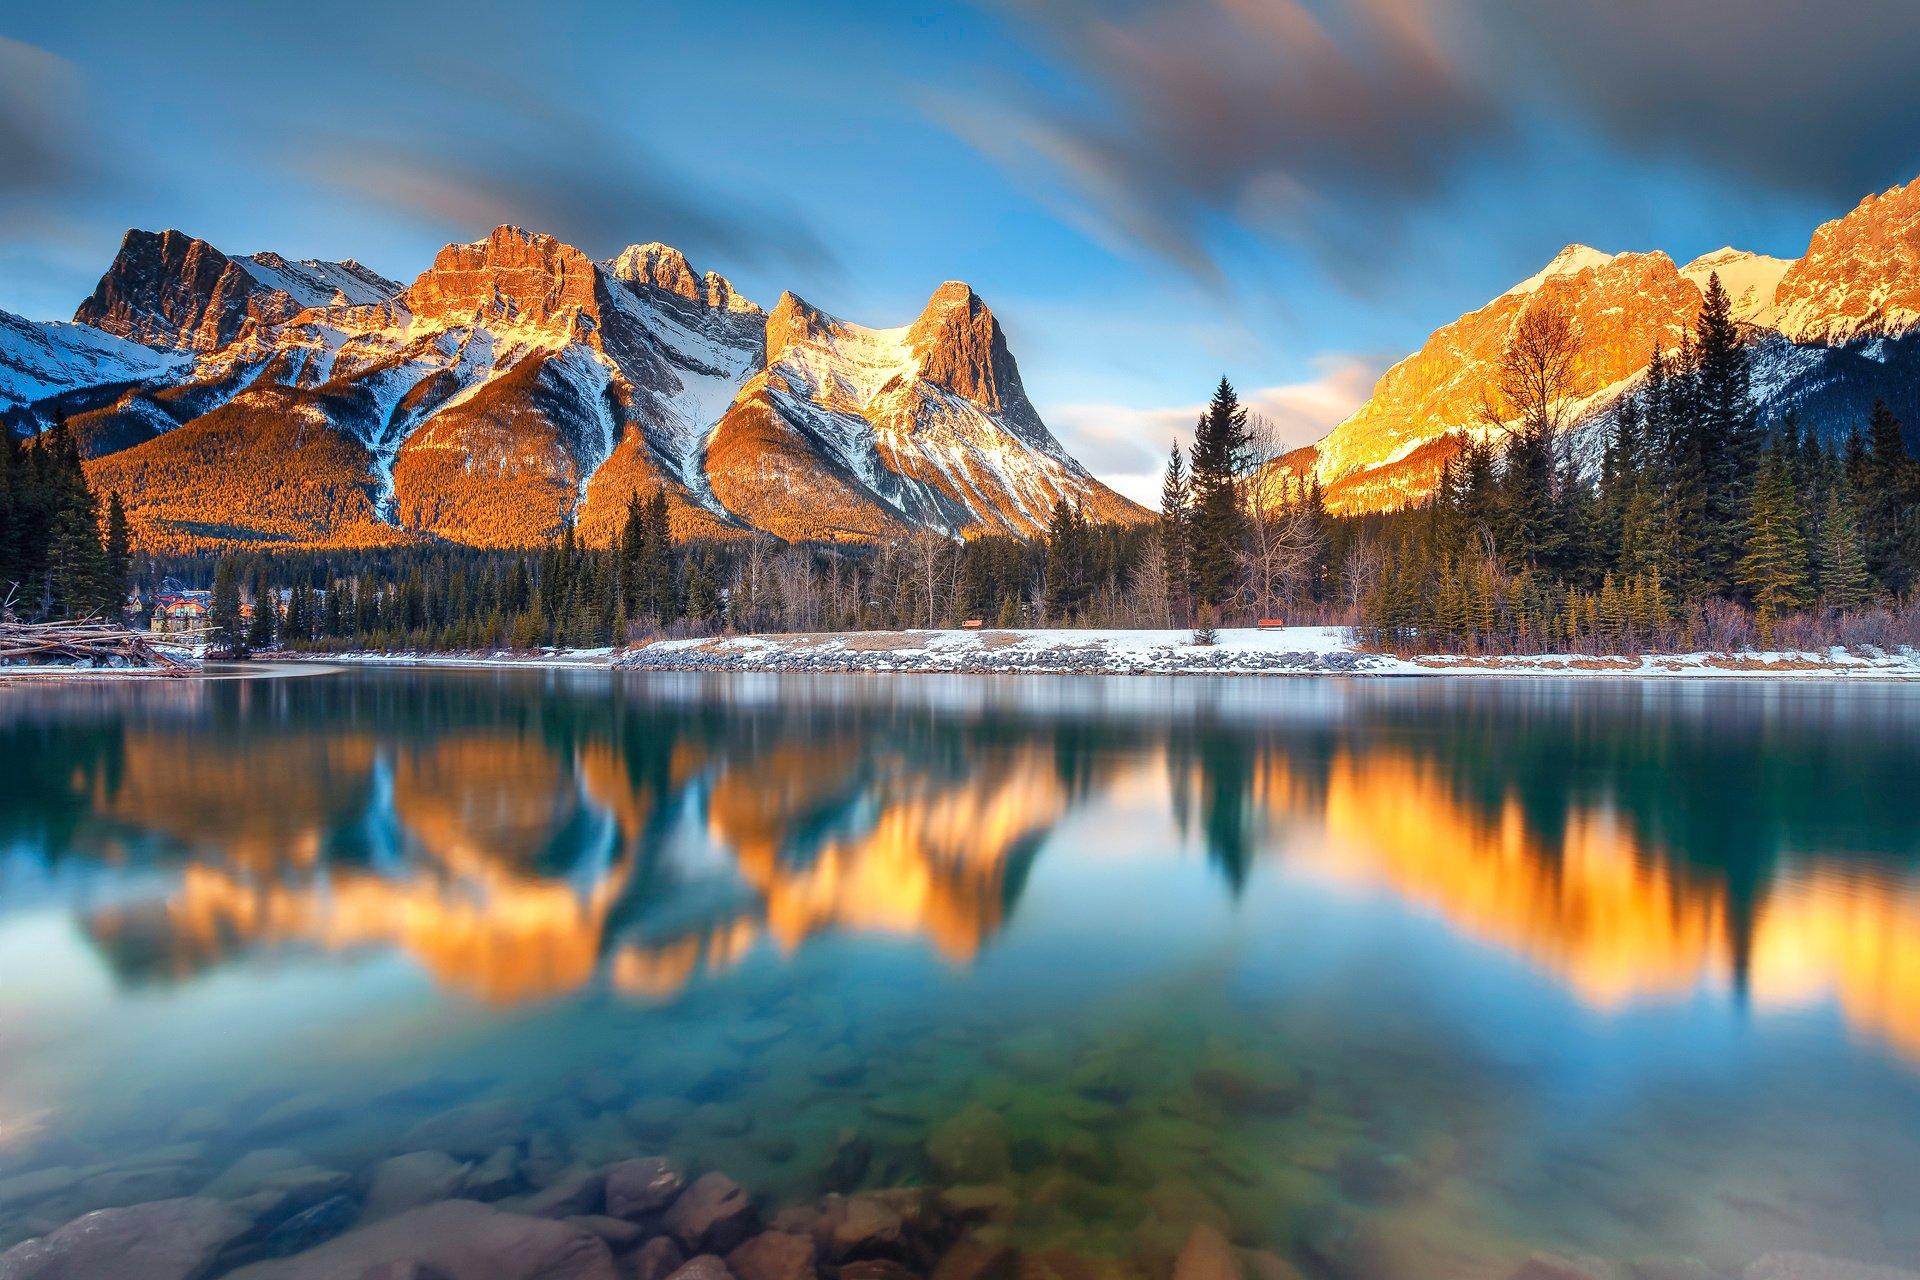 Landscape nature mountains lake reflection alberta canada for Wallpaper canada